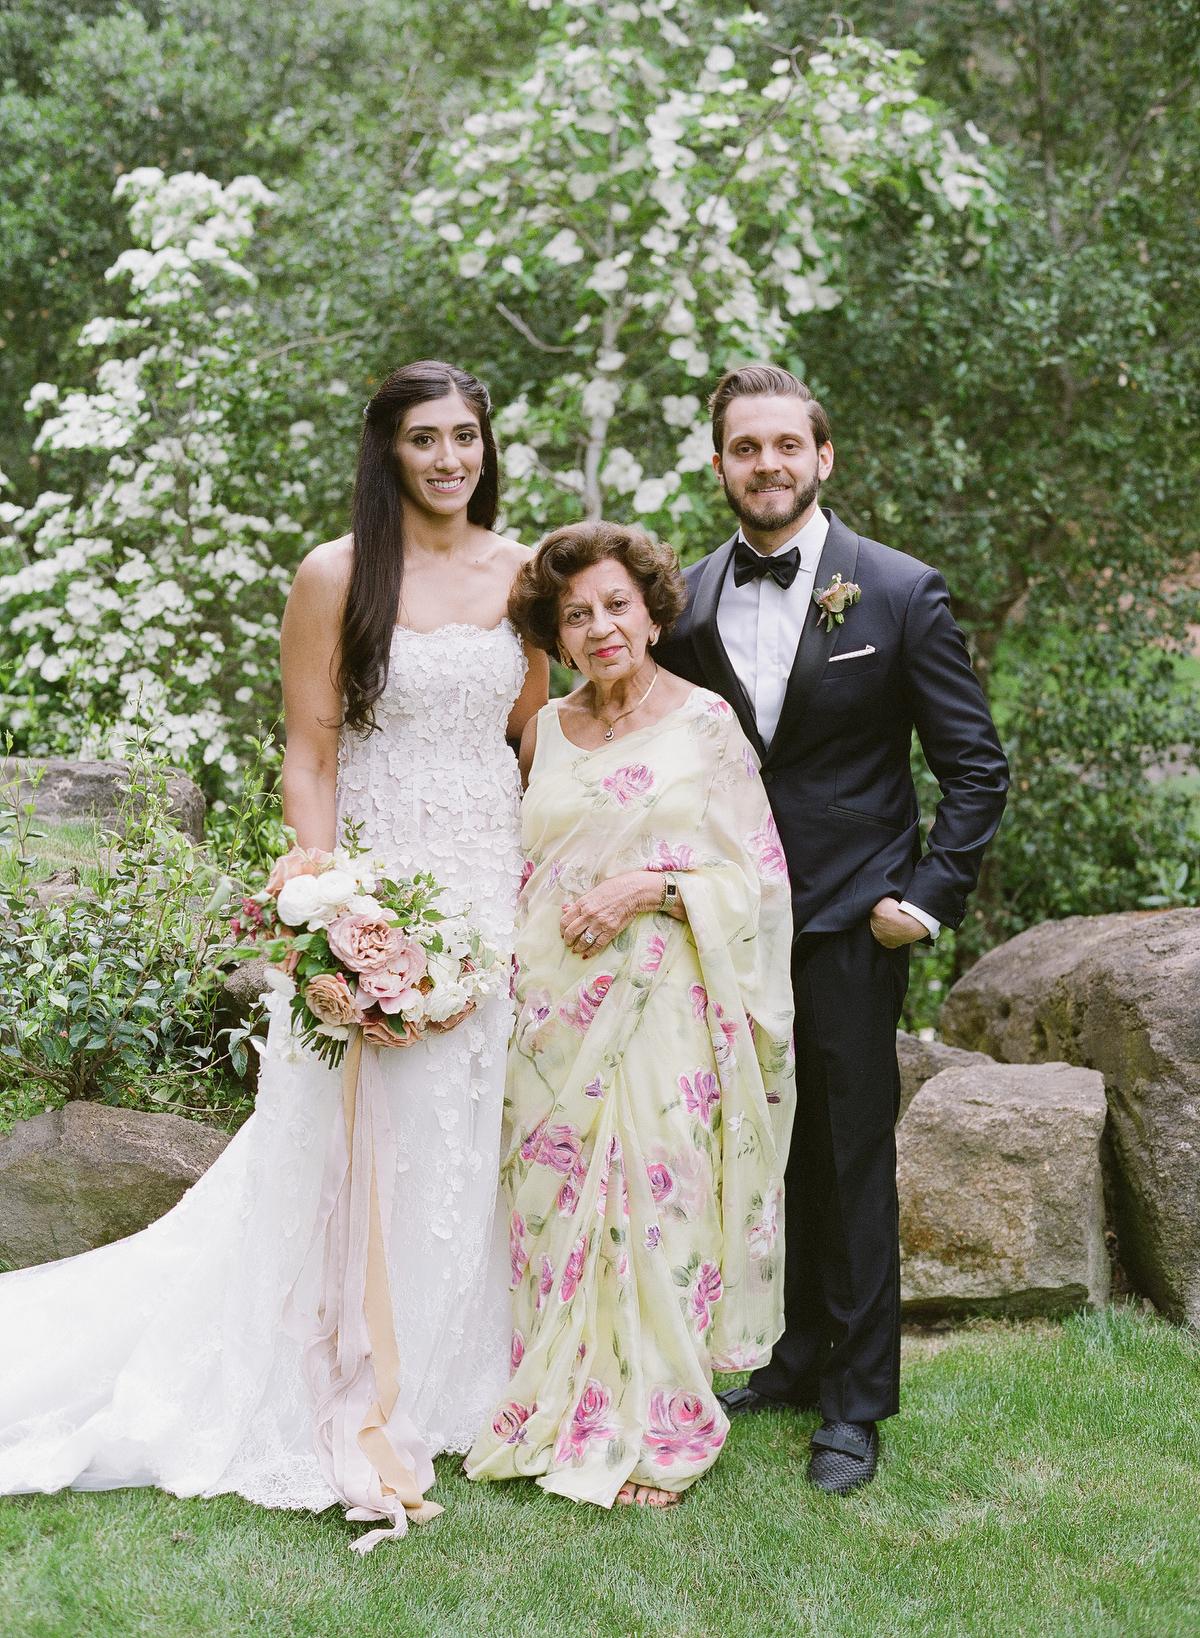 nadine dan wedding couple with family